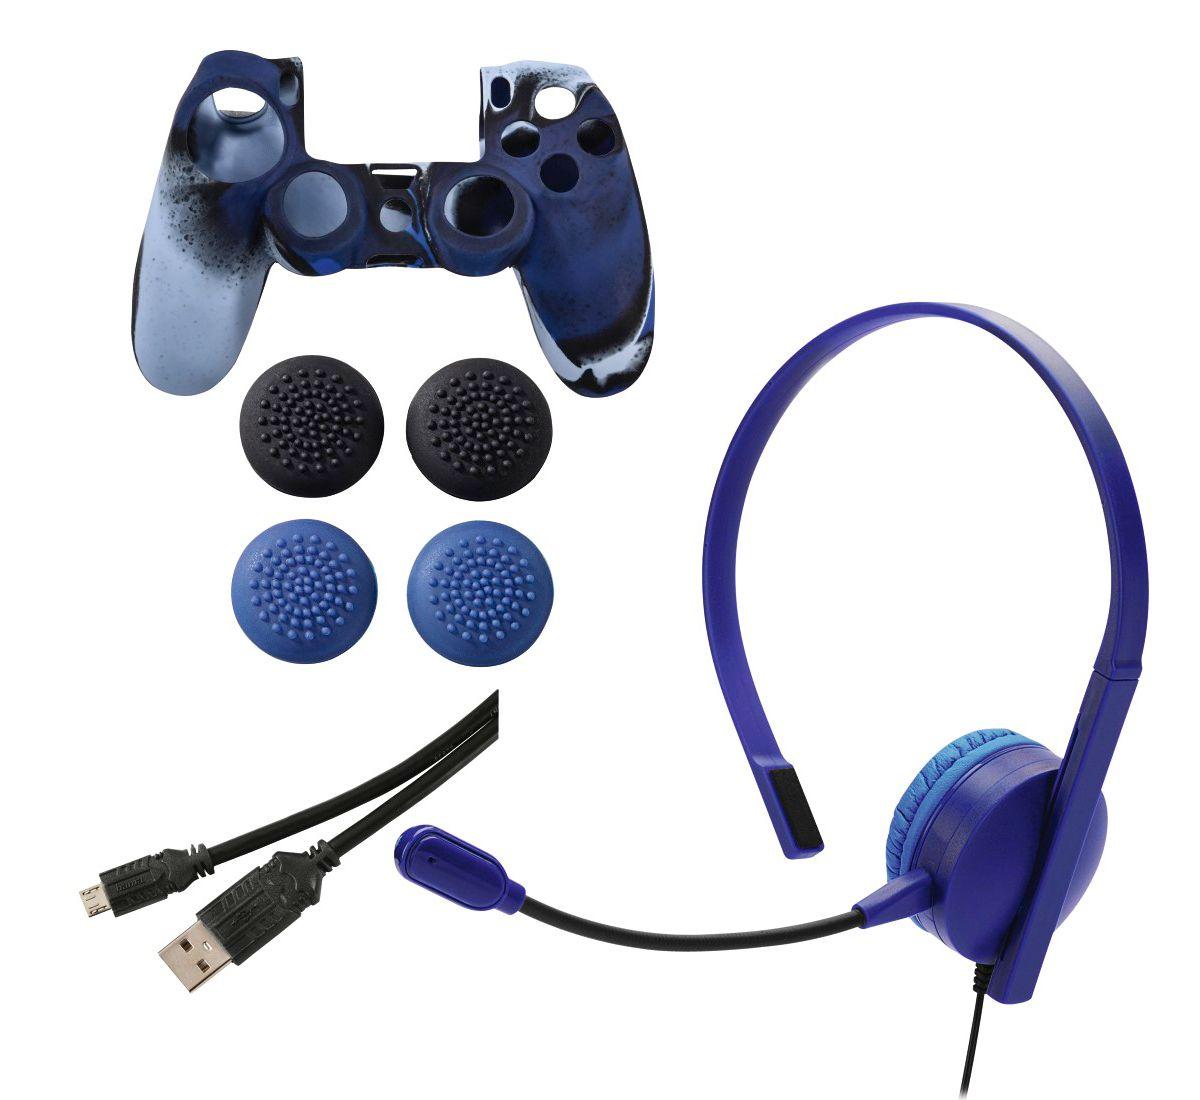 Hama Zubehör Set f. PS4/Slim/Pro Dualshock Cont...